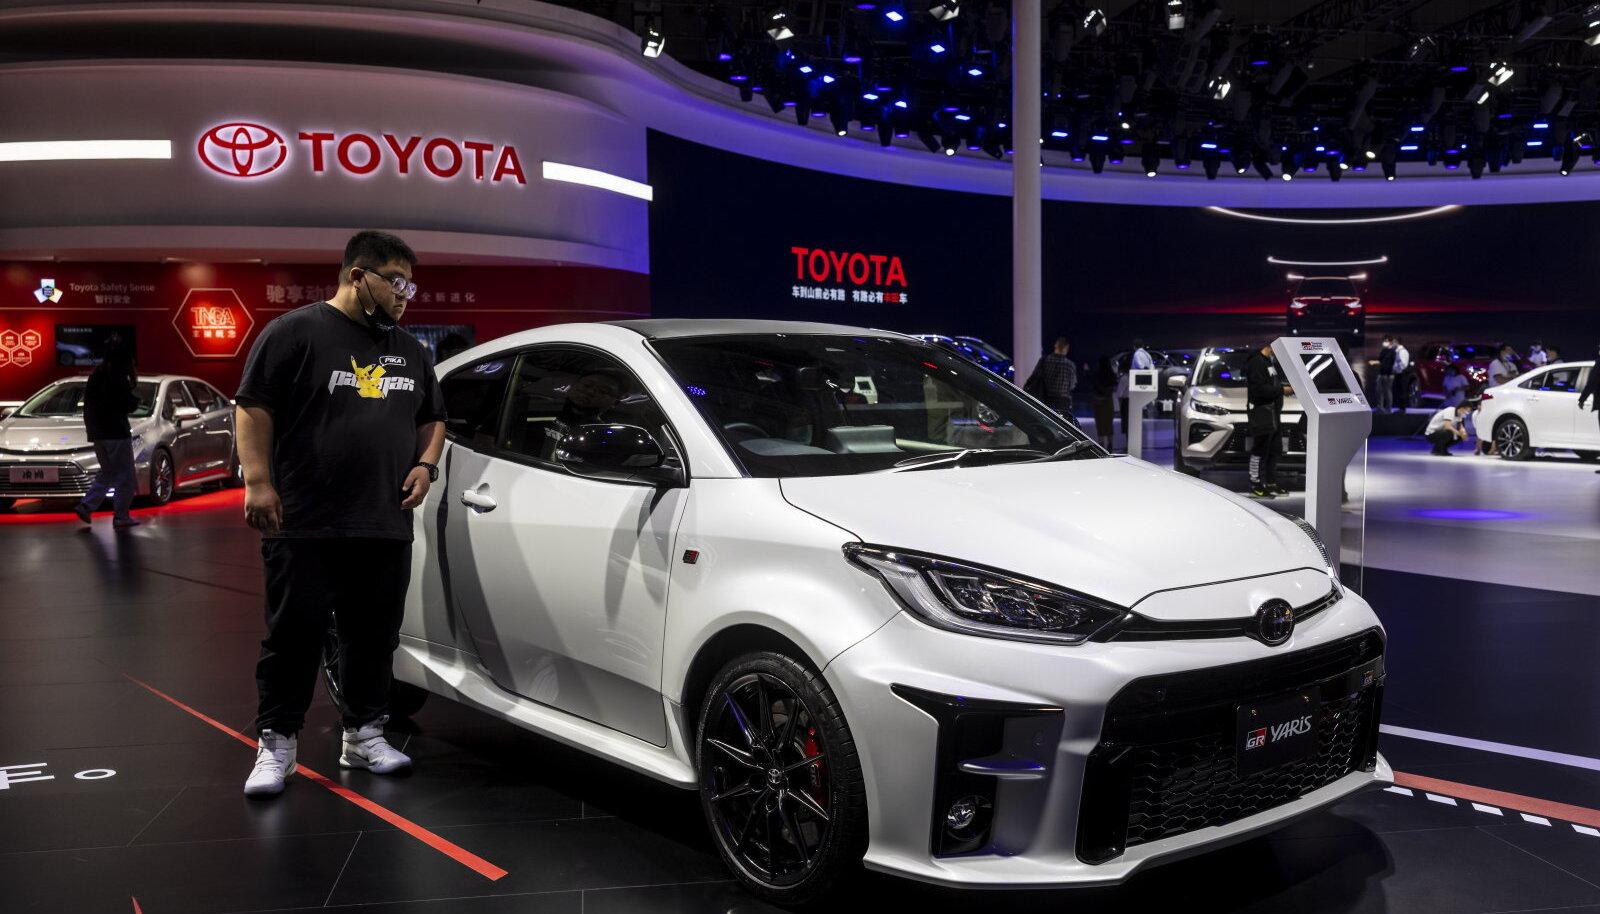 Hetkel uusim Toyota Yaris